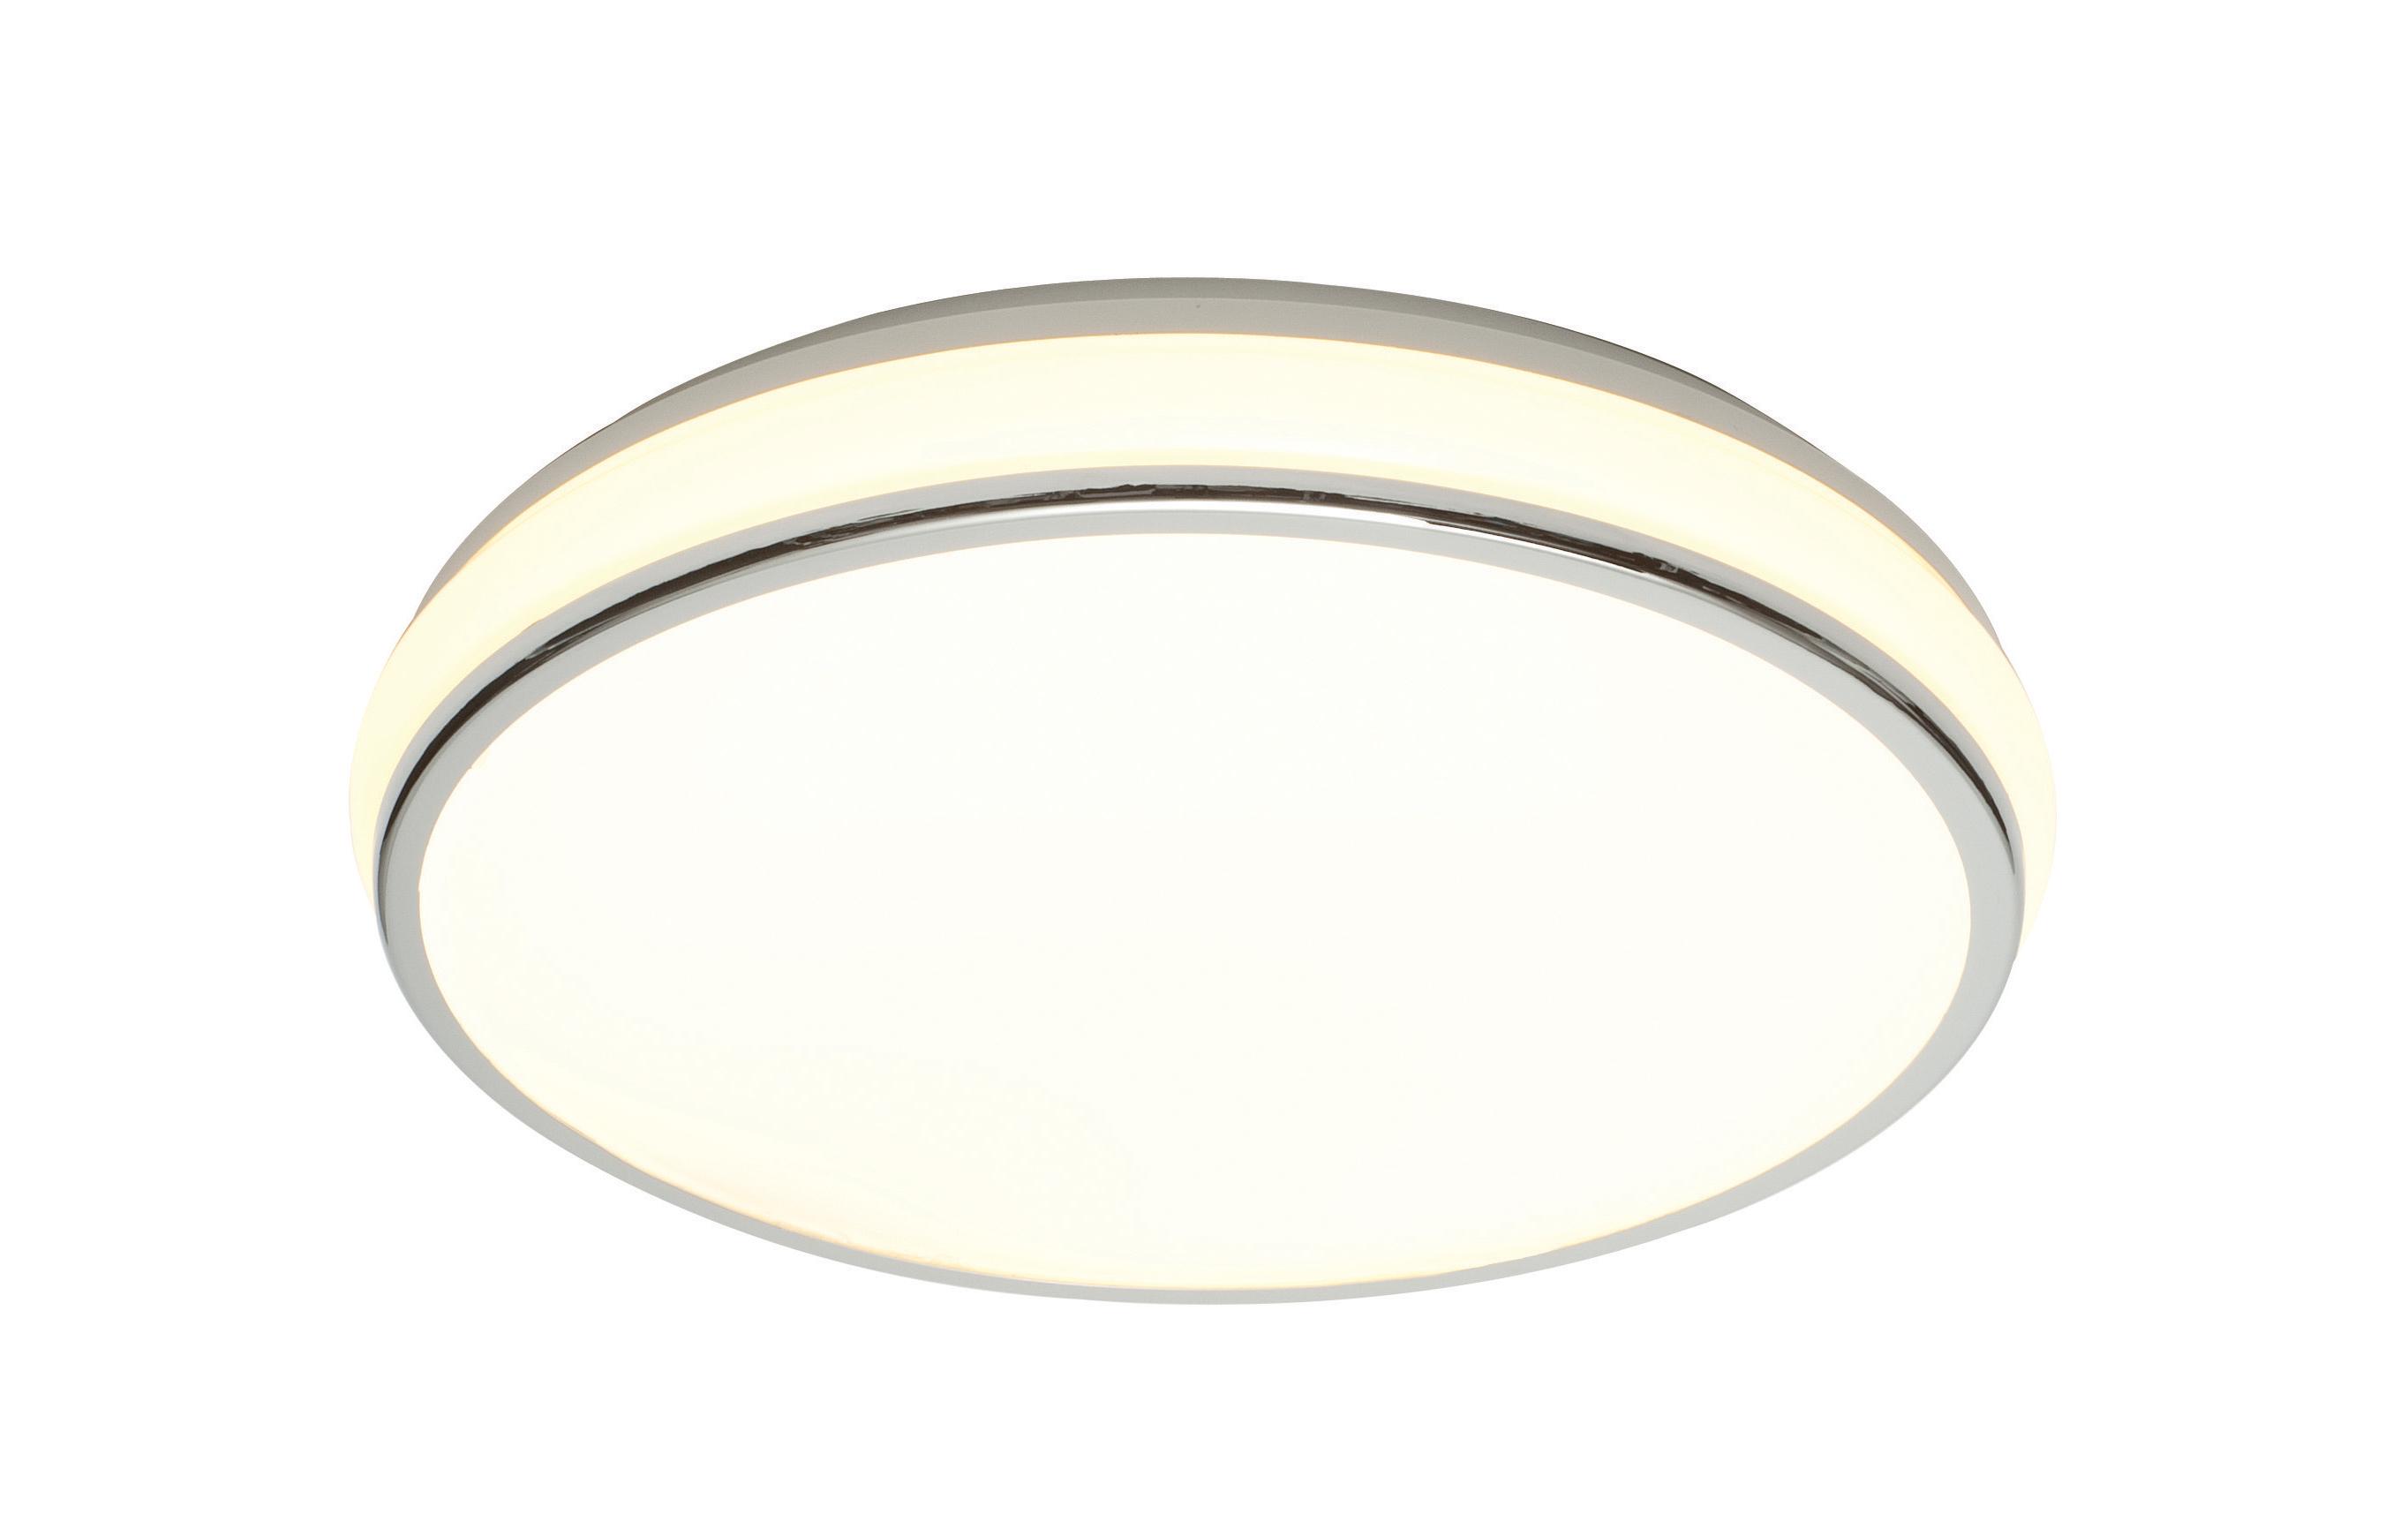 Saxby Torus Large 39610 round bathroom wall light 1x40W 2GX13 T5 IP44 acrylic eBay